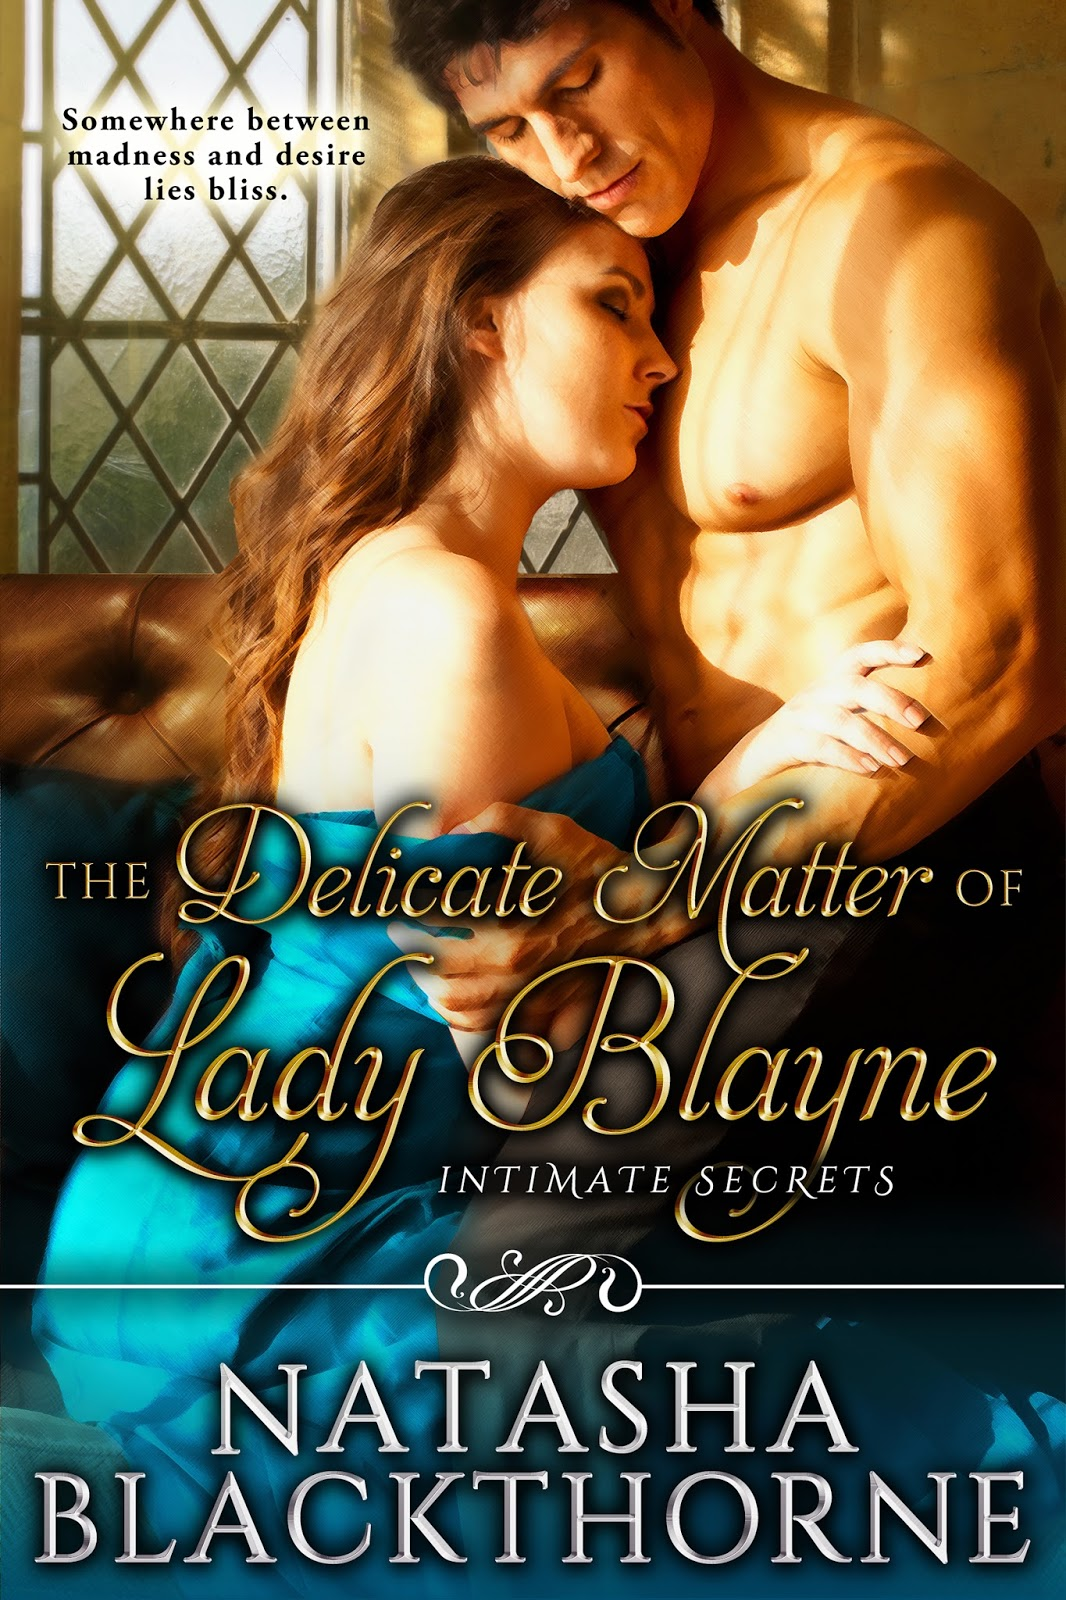 erotic romance novels excerpts jpg 853x1280